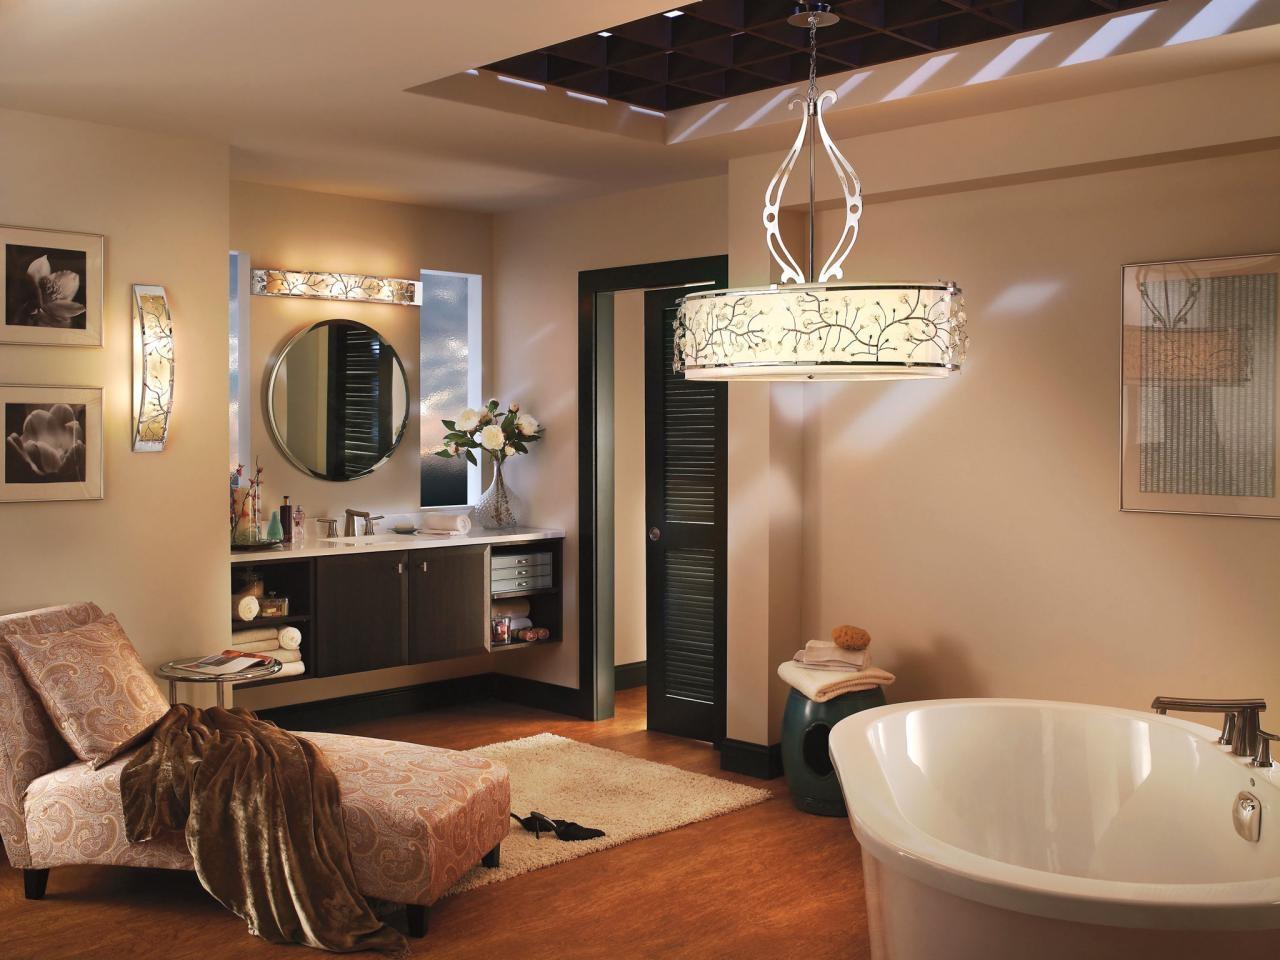 Bathroom Lamps Within Bathroom Lighting Chandeliers (View 13 of 25)